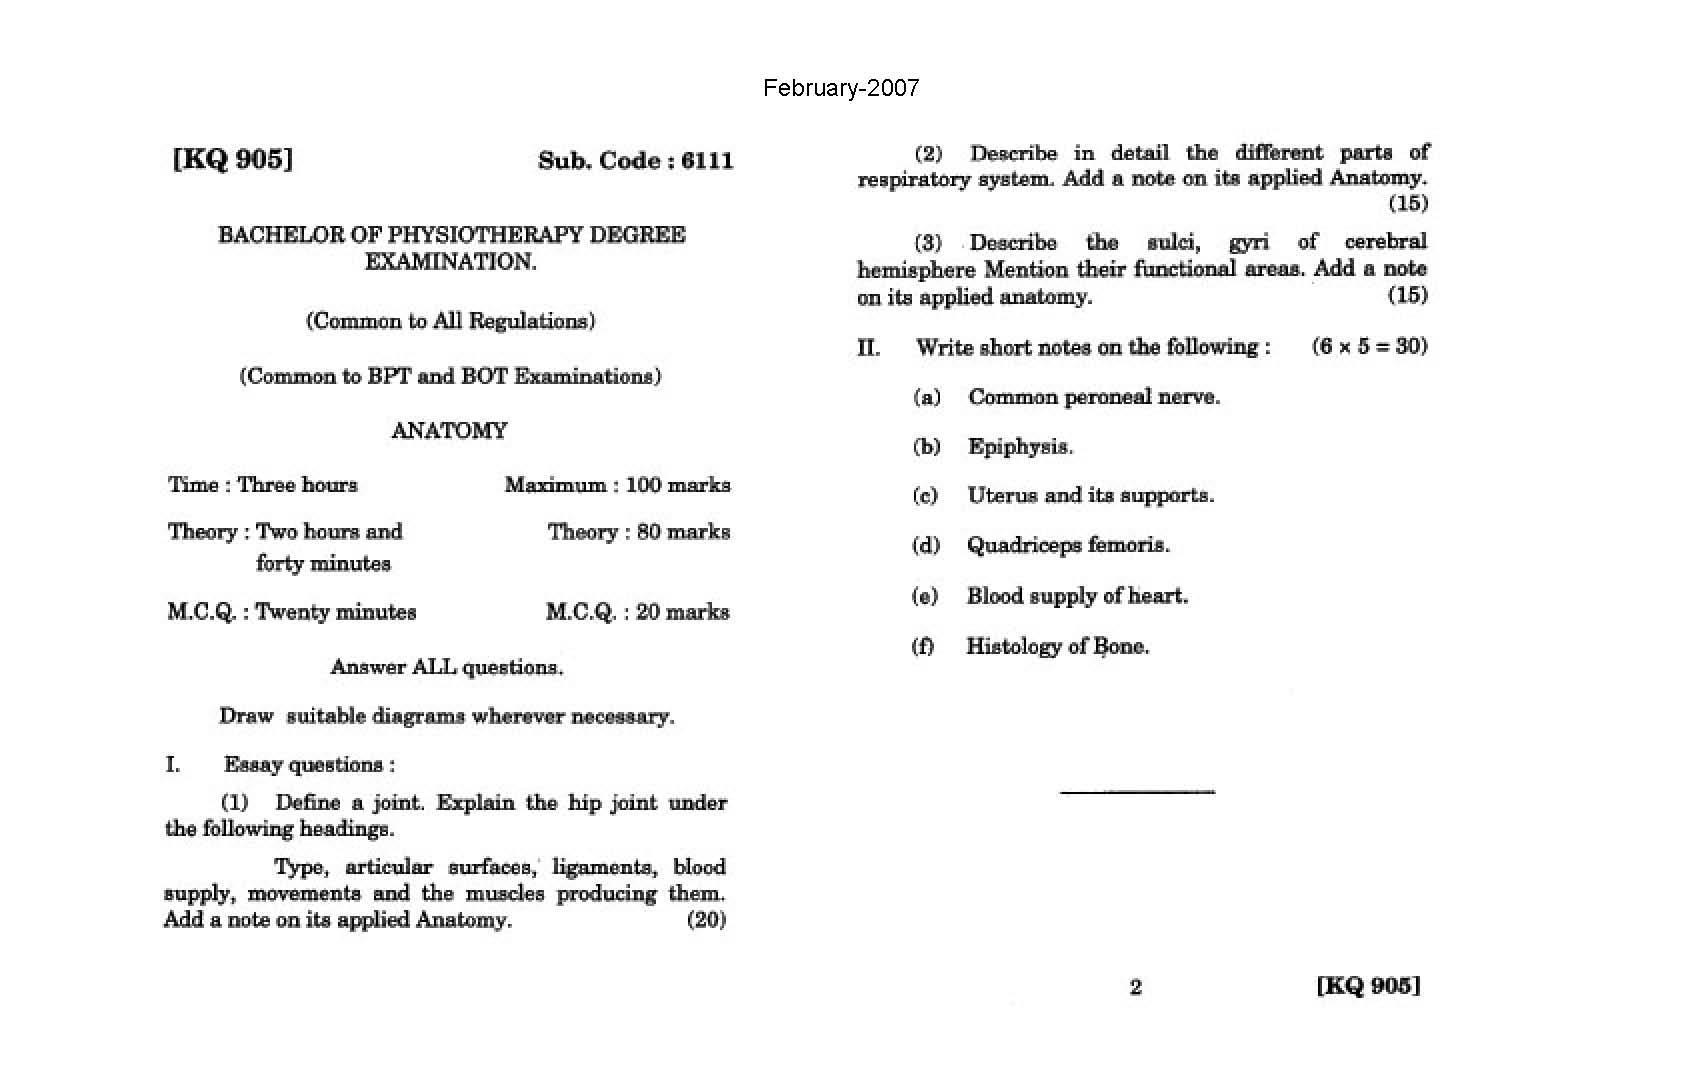 The Tamil Nadu Dr. MGR Medical University General Anatomy - Feb 2006 ...